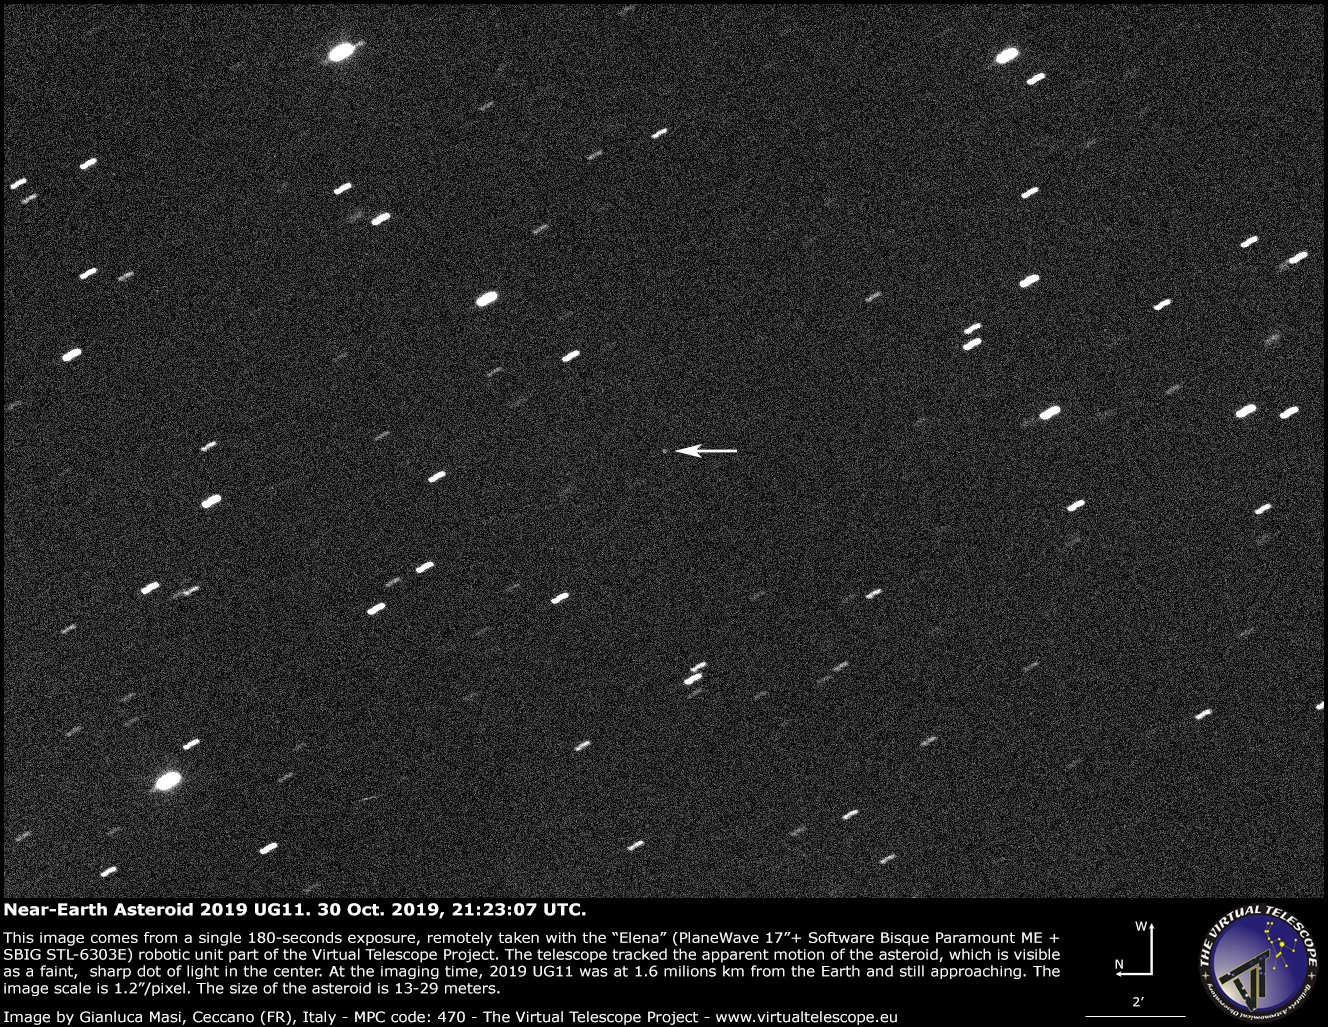 Near-Earth Asteroid 2019 UG11: 30 Oct. 2019